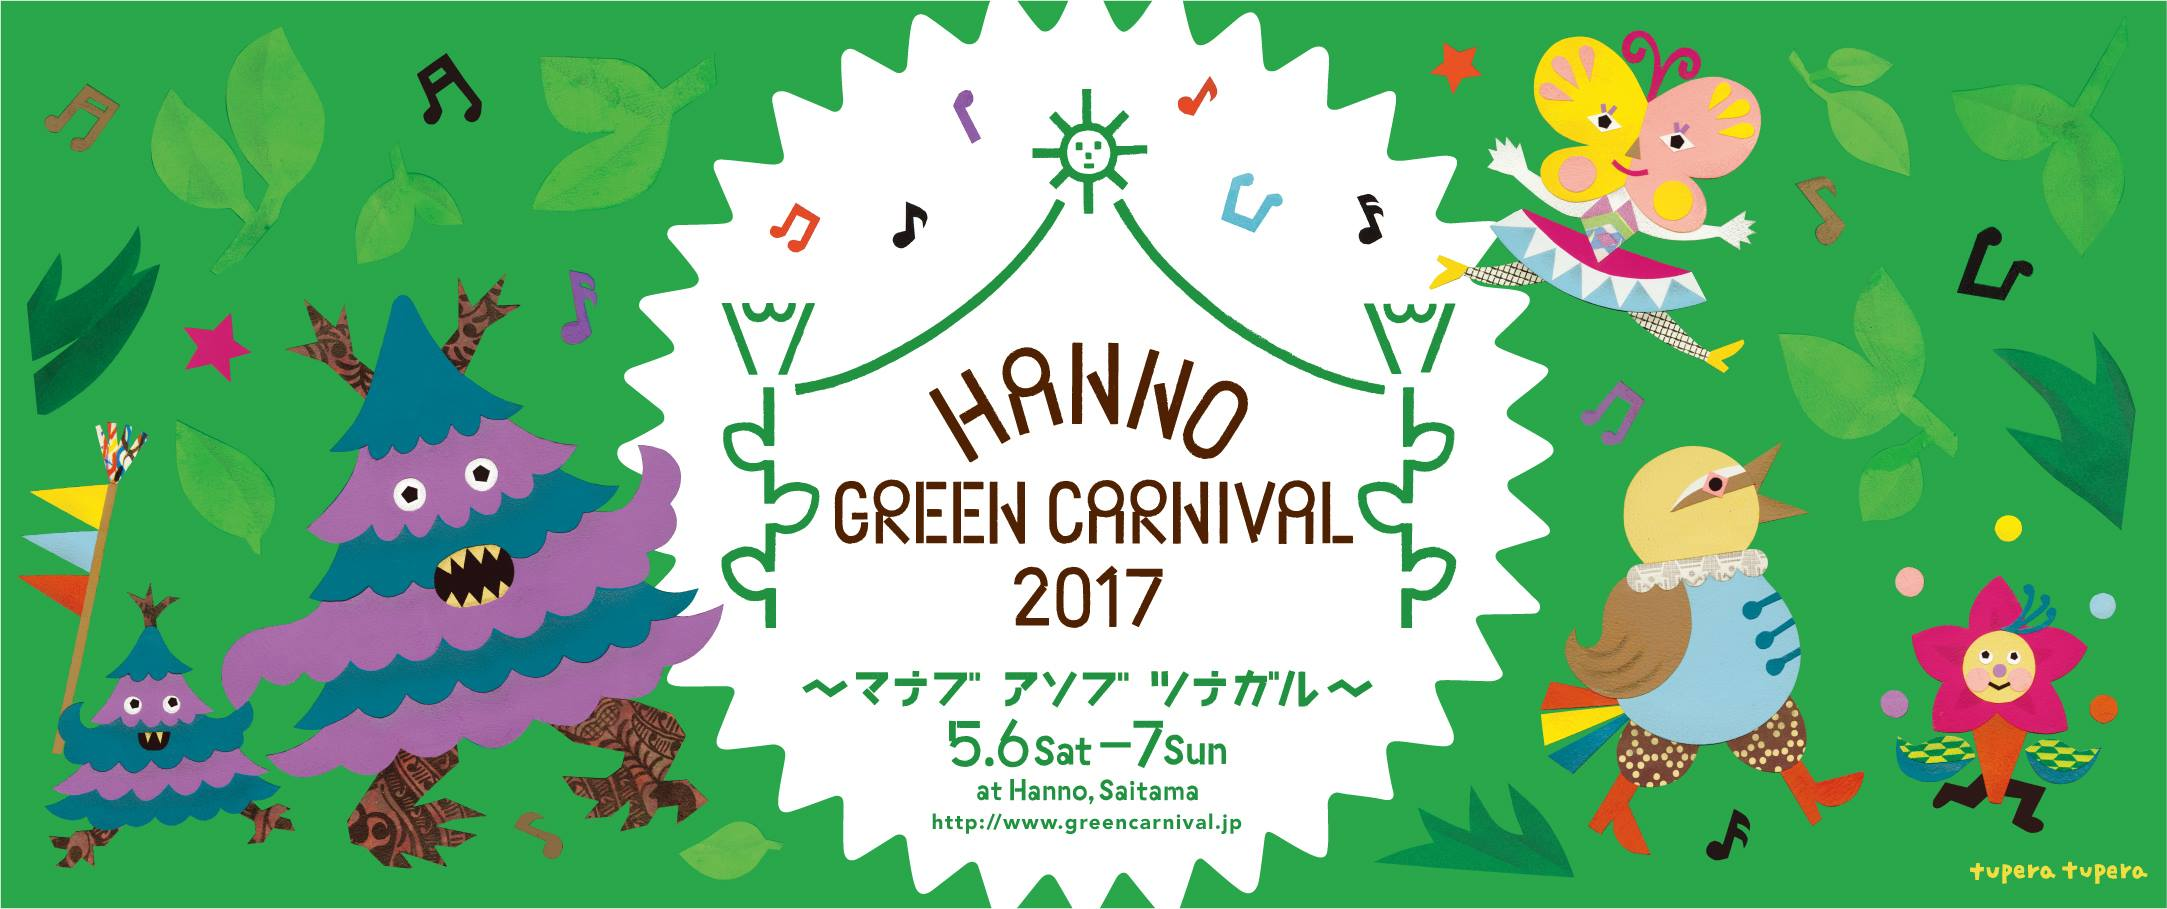 『Hanno Green Carnival 2017』にて門秀彦のワークショップ開催!